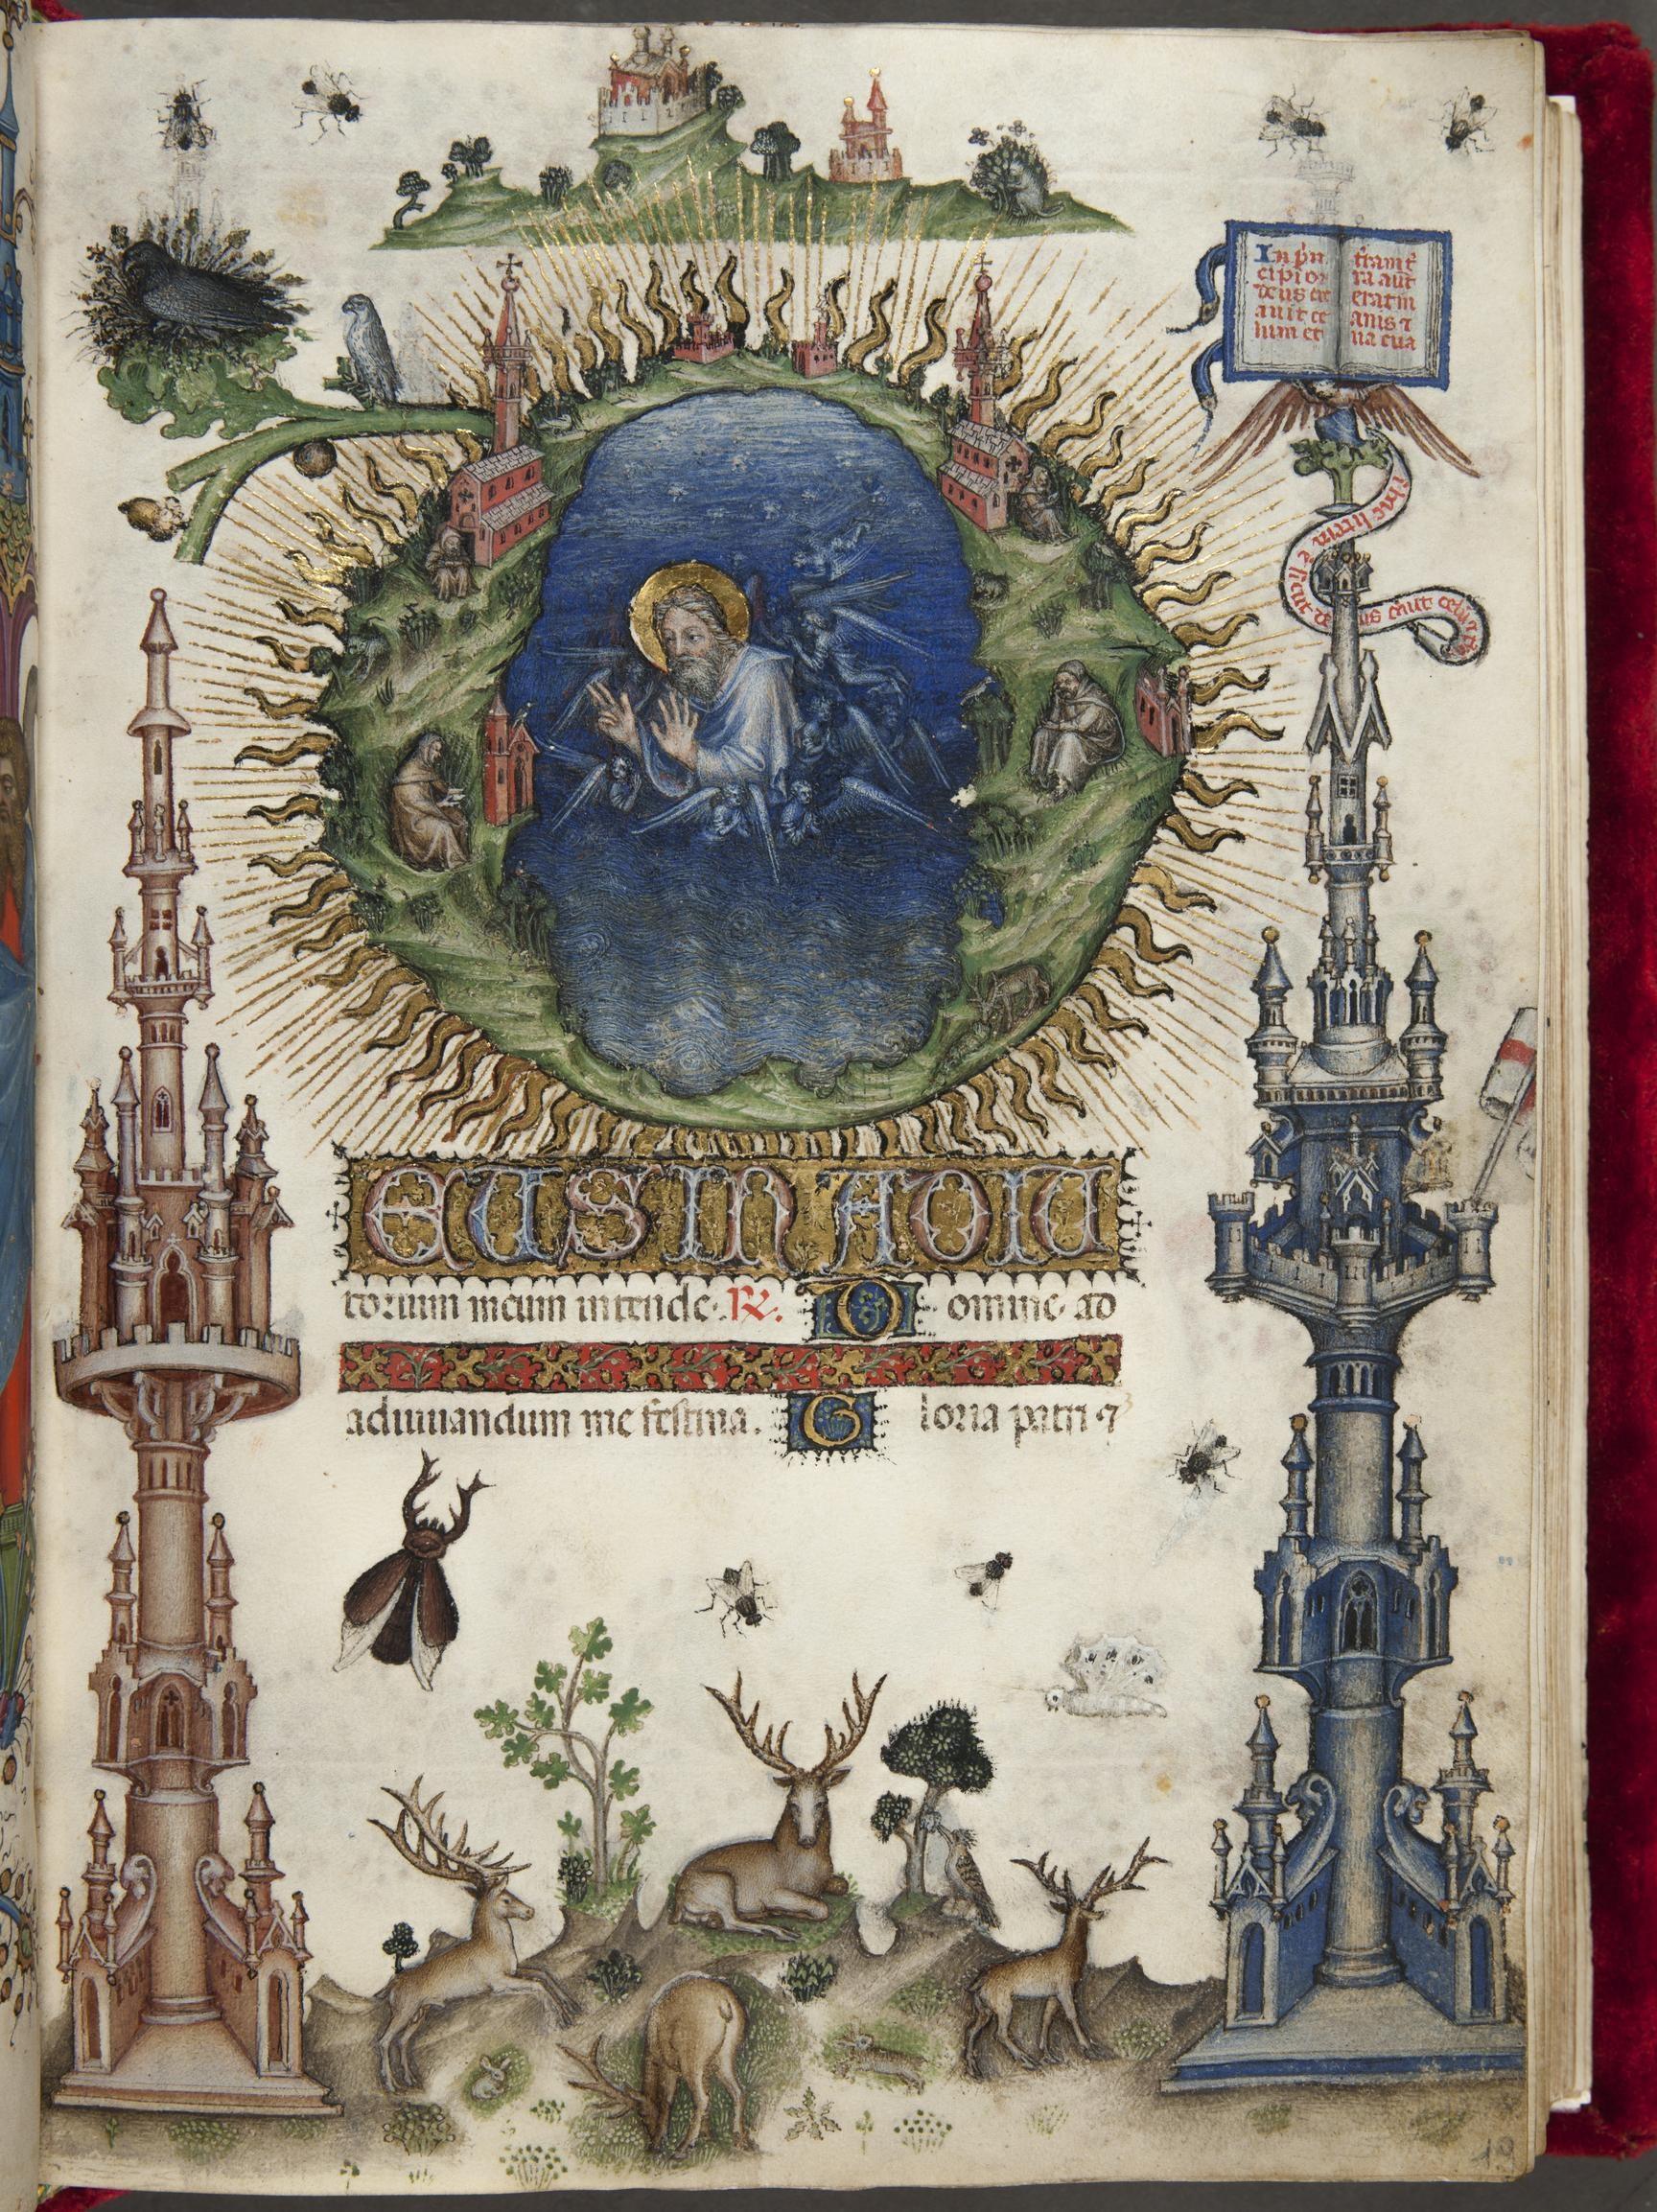 Livre d'Heures de Jean Galeas Visconti Vol 2 Florence FBNC Landau Finaly 22 fol LF19 25 × 18 cm 1412 ca Belbello da Pavia